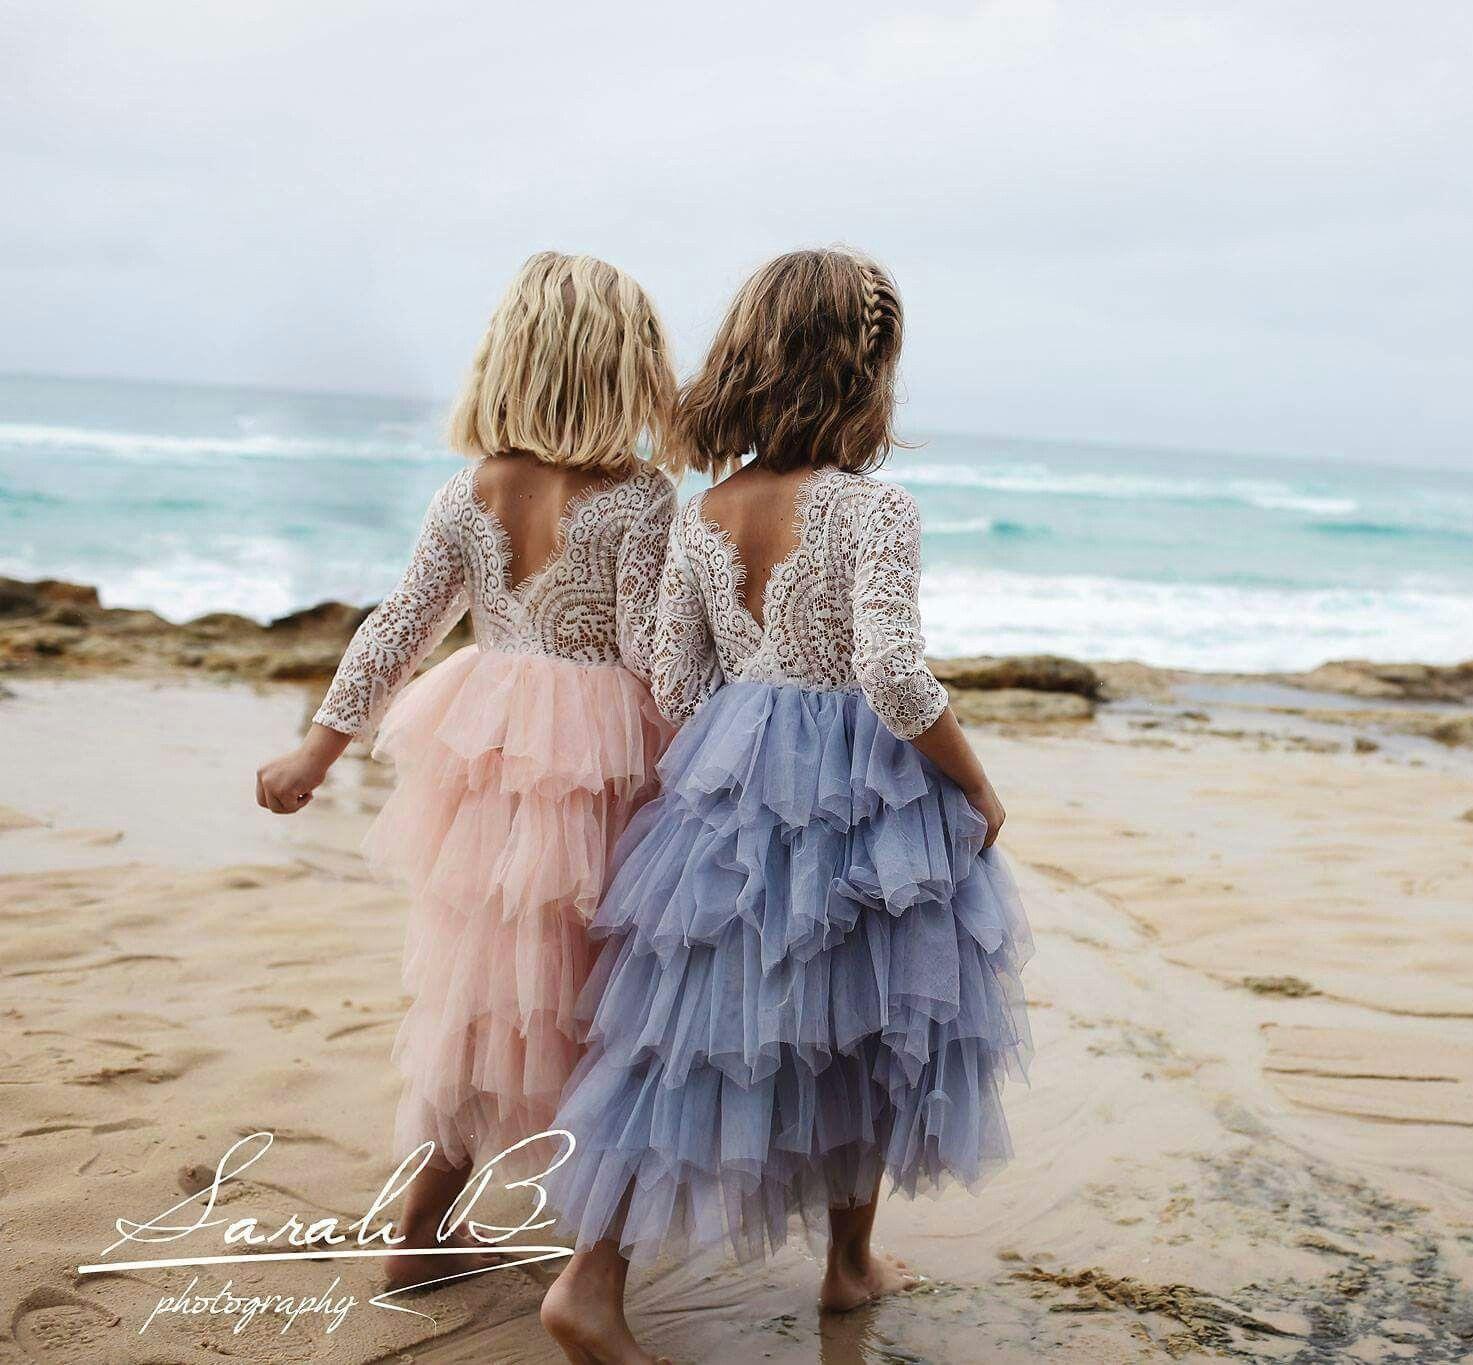 Arabella and rose i do pinterest wedding things wedding and